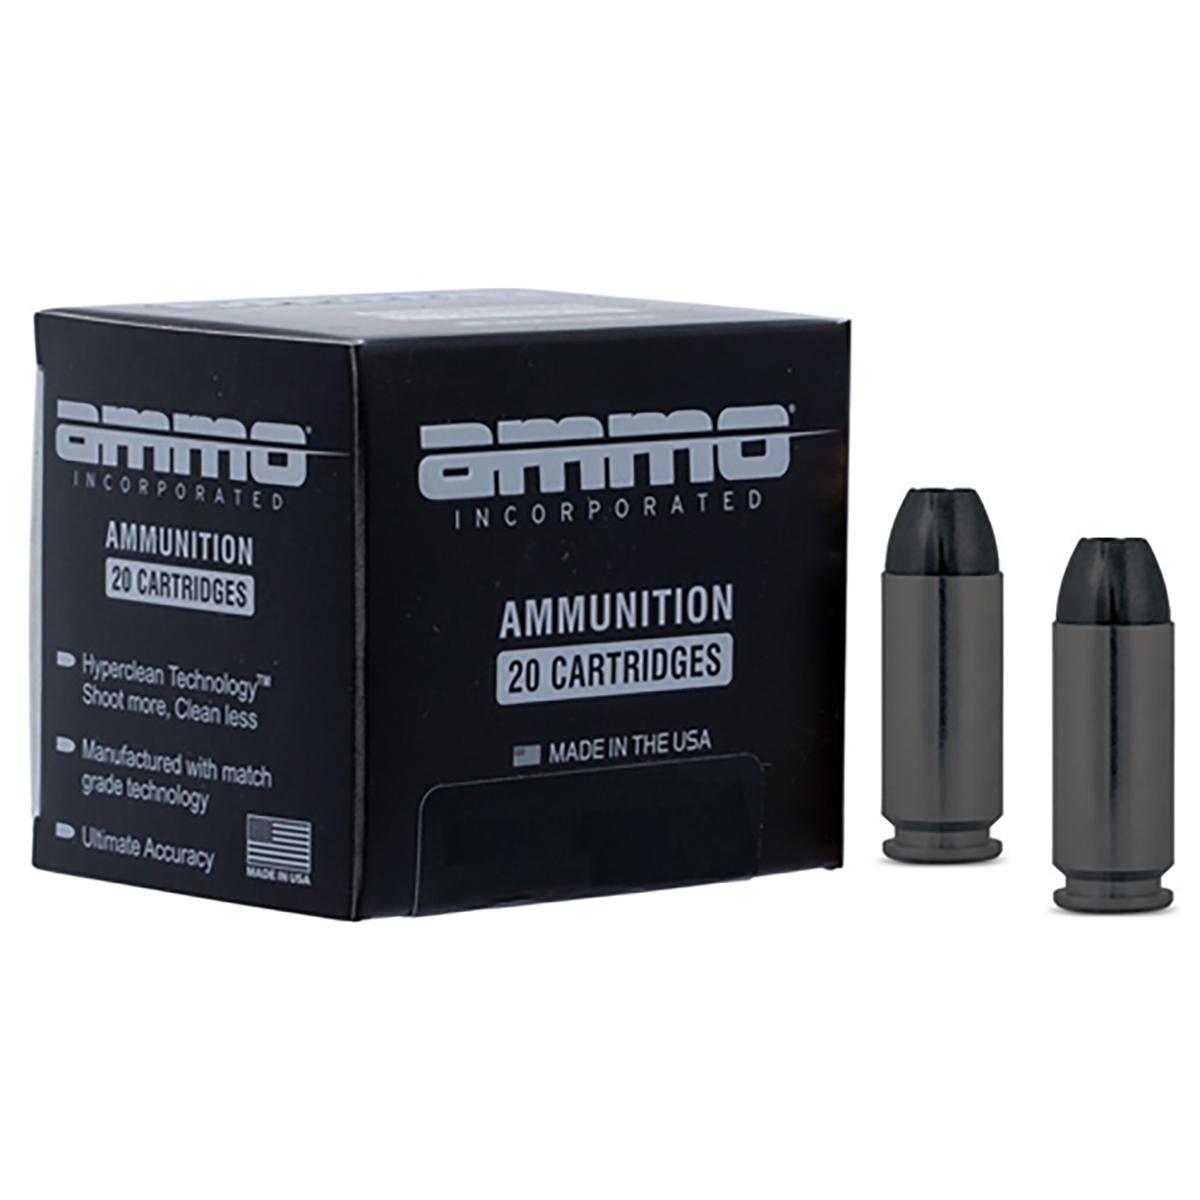 Ammo Inc. Black Label HP .45 ACP Ammunition, 20 Ct.